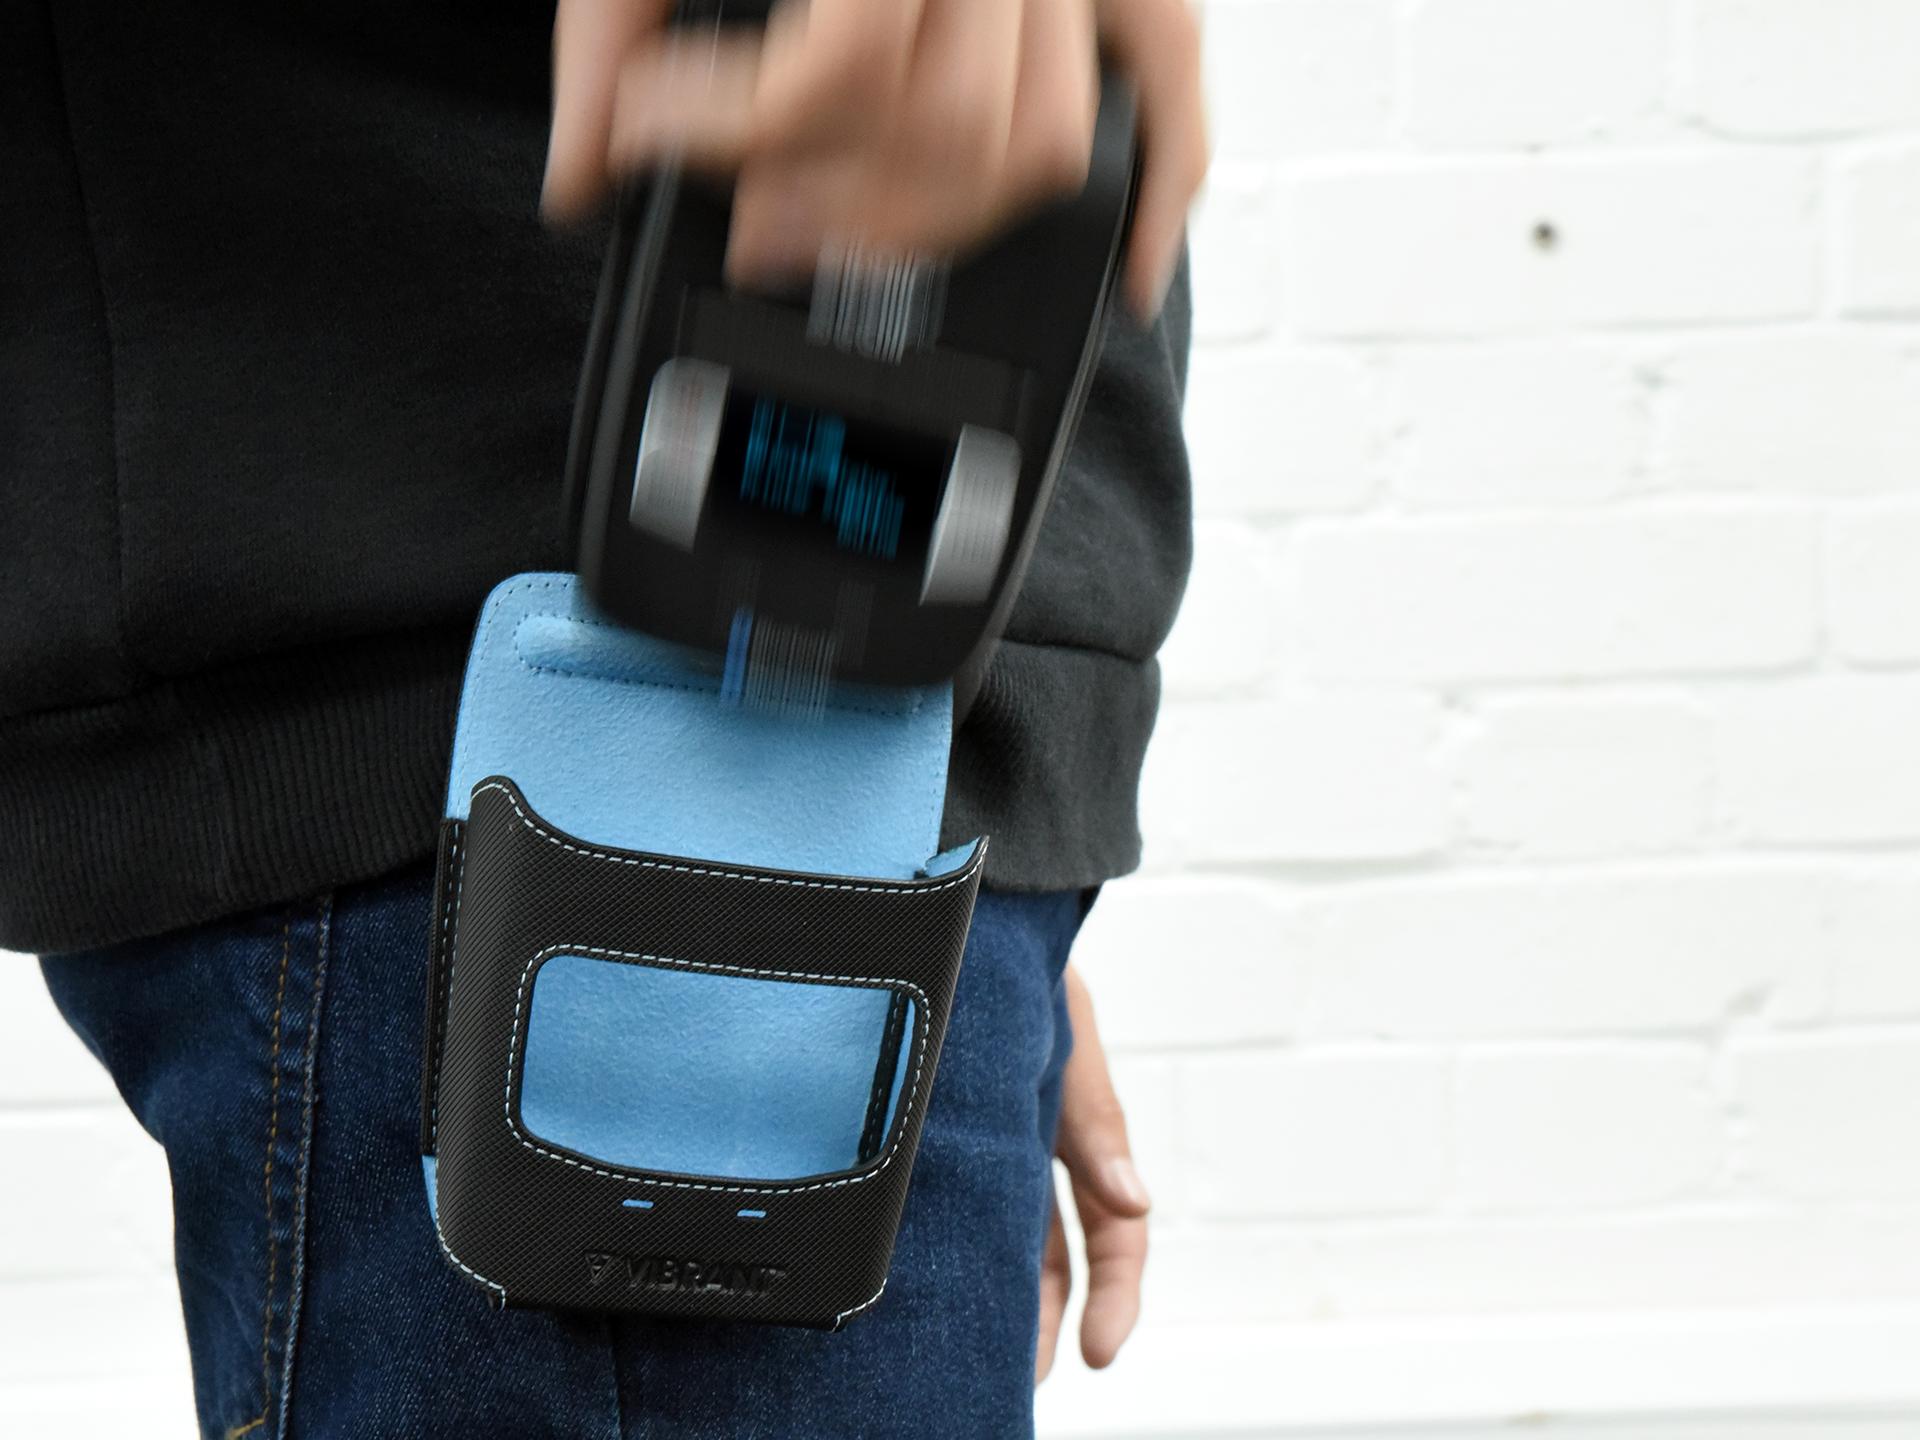 Vprint Mobile bluetooth printer holster case Grid 1.png